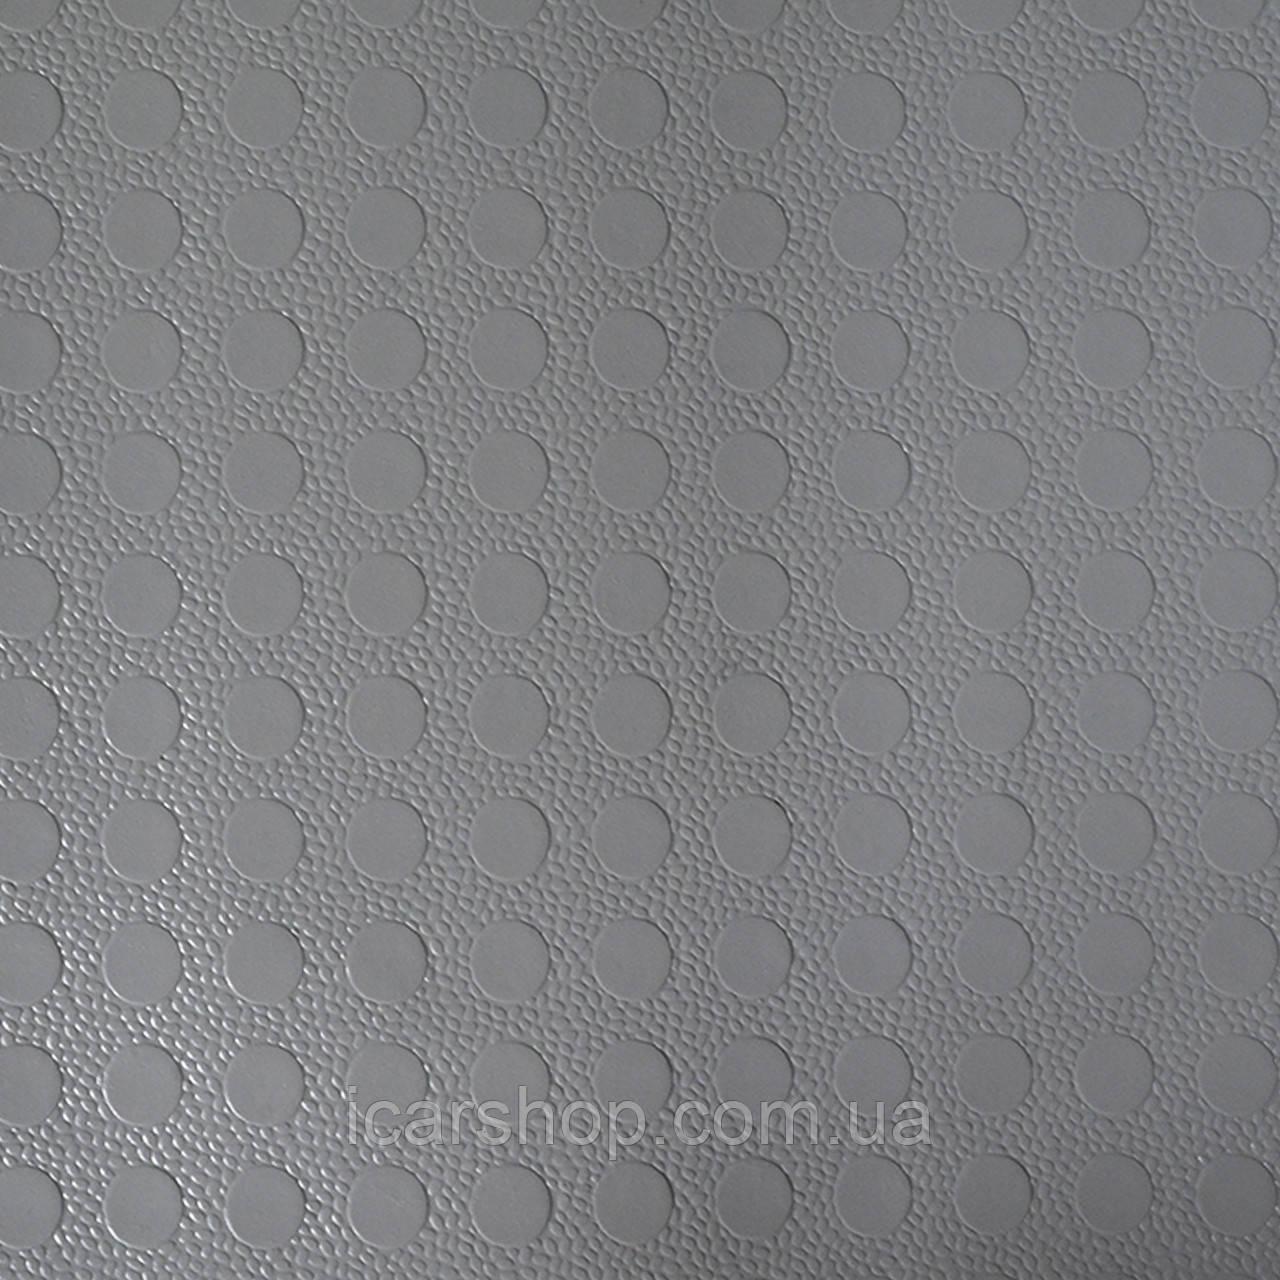 Автолин 2 м. MFSY 172 / Копейка мозаика Серый (Турция)